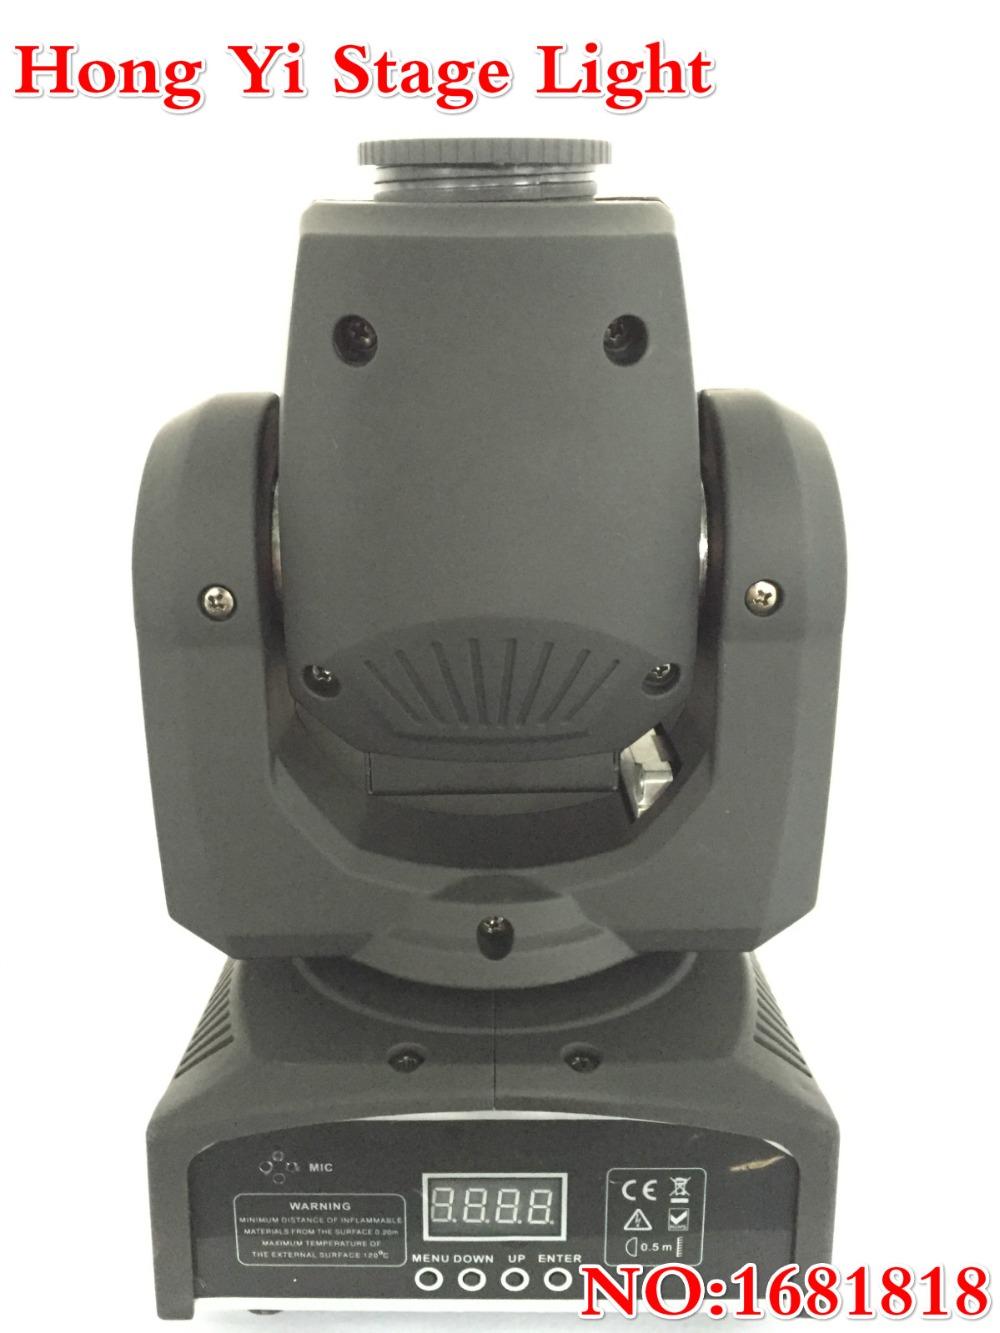 2016 Hot Factory direct sale 30w LED Moving Head Lights spotlight dj set gobo dj light projector for bar event(China (Mainland))